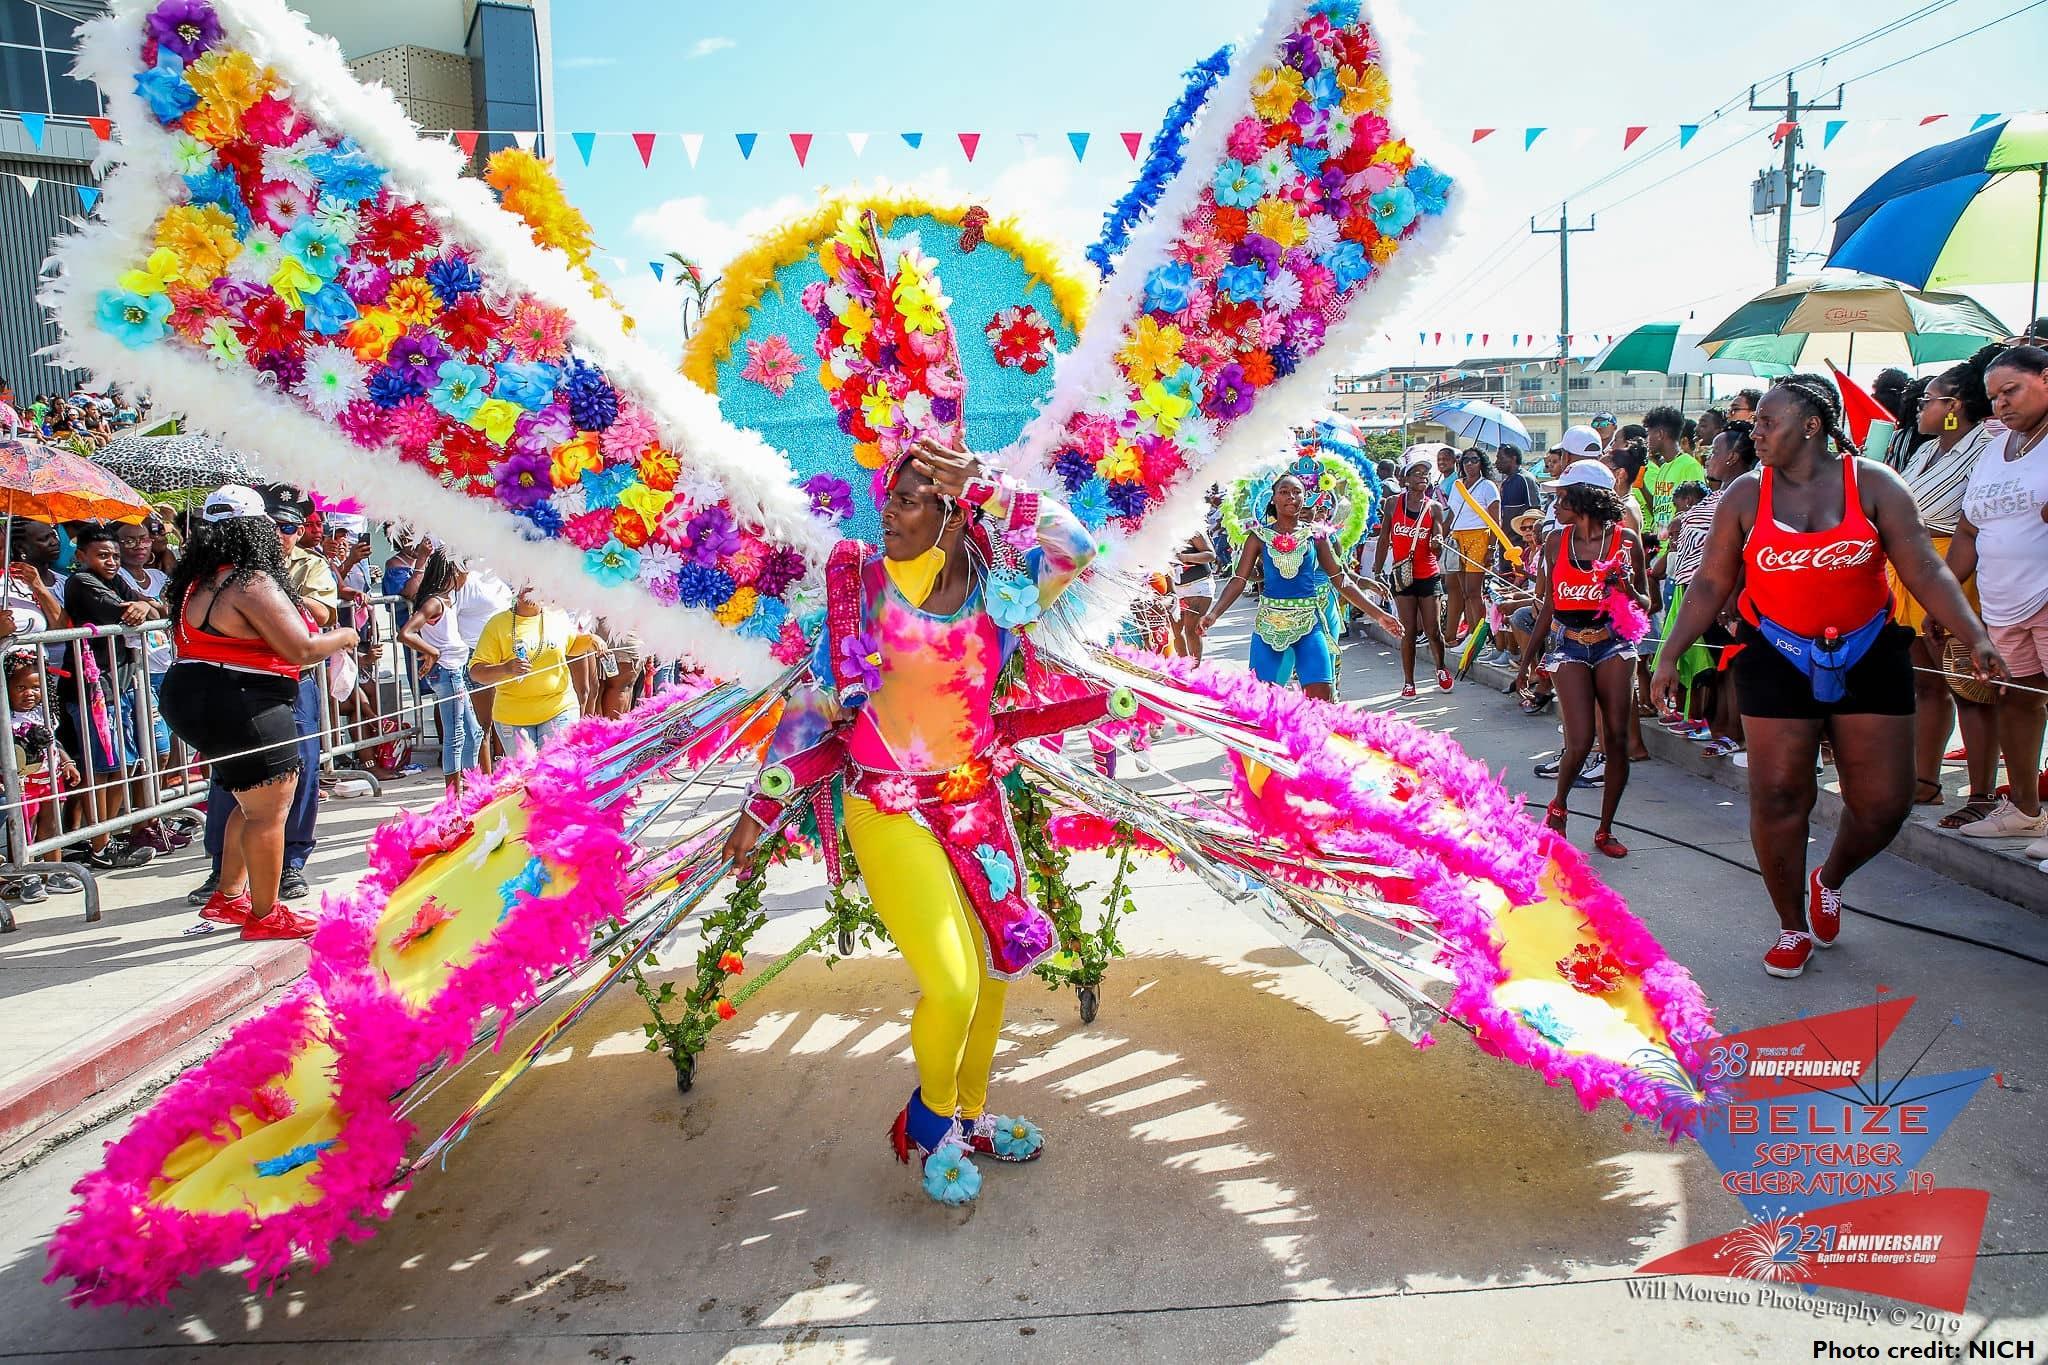 Carnival_in_Belize(NICH提供)(500k).jpg